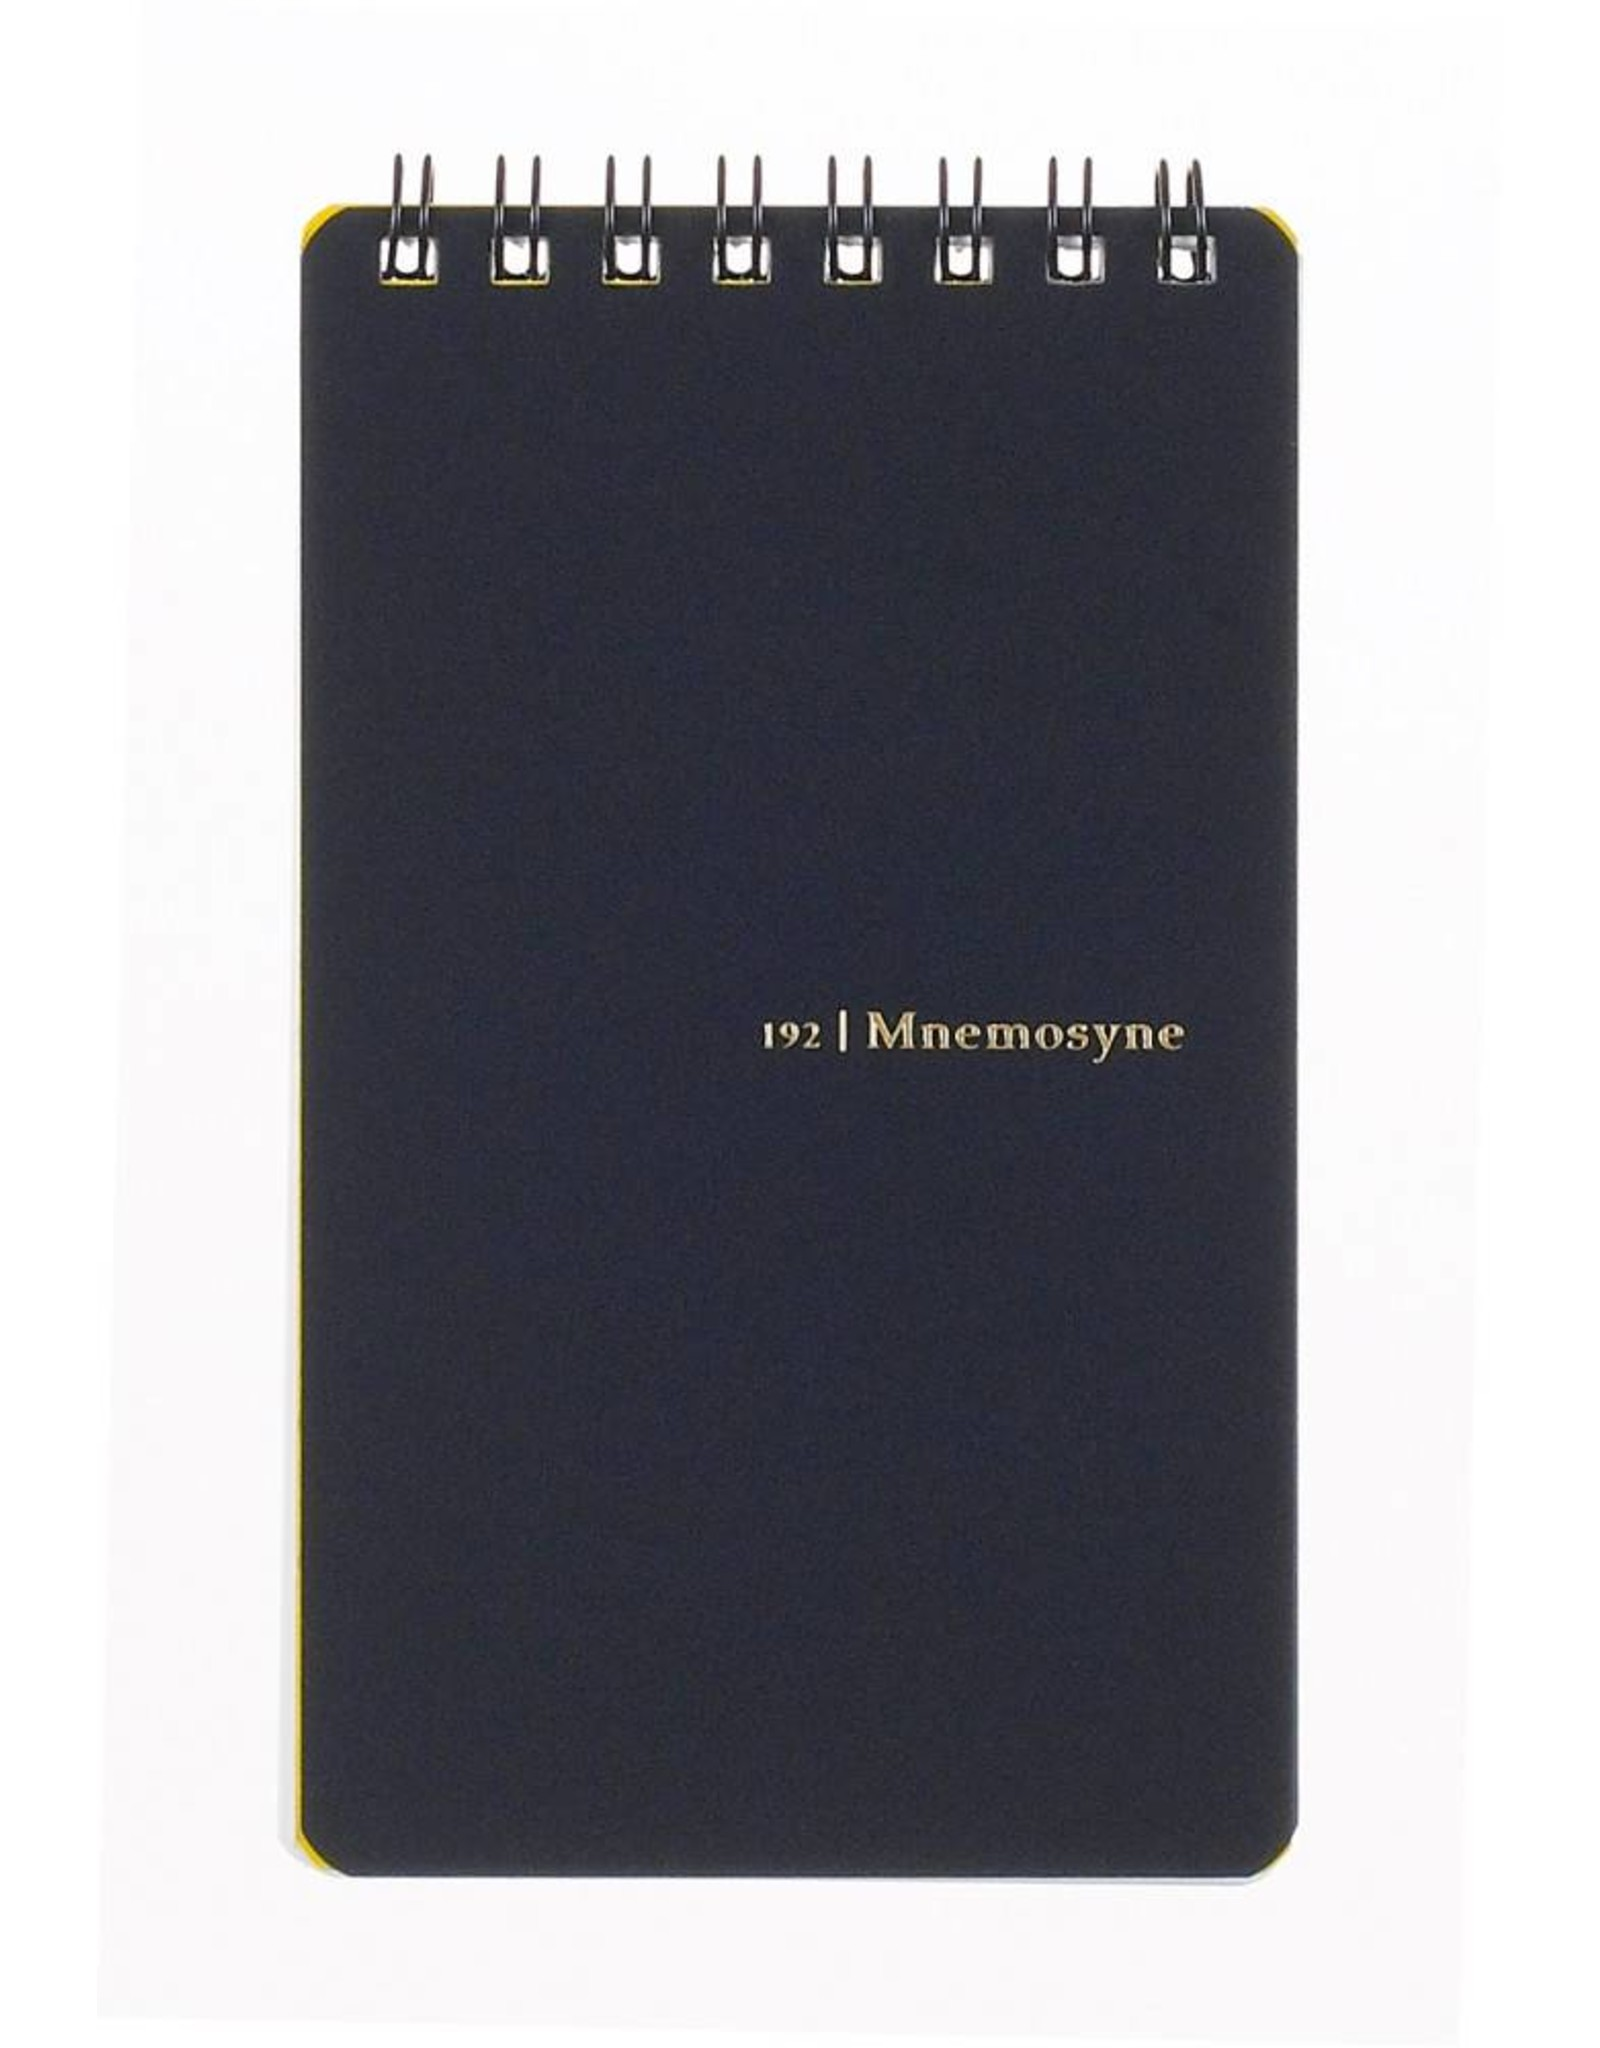 MARUMAN MNEMOSYNE MEMO 5MM RULED B7 132X77MM